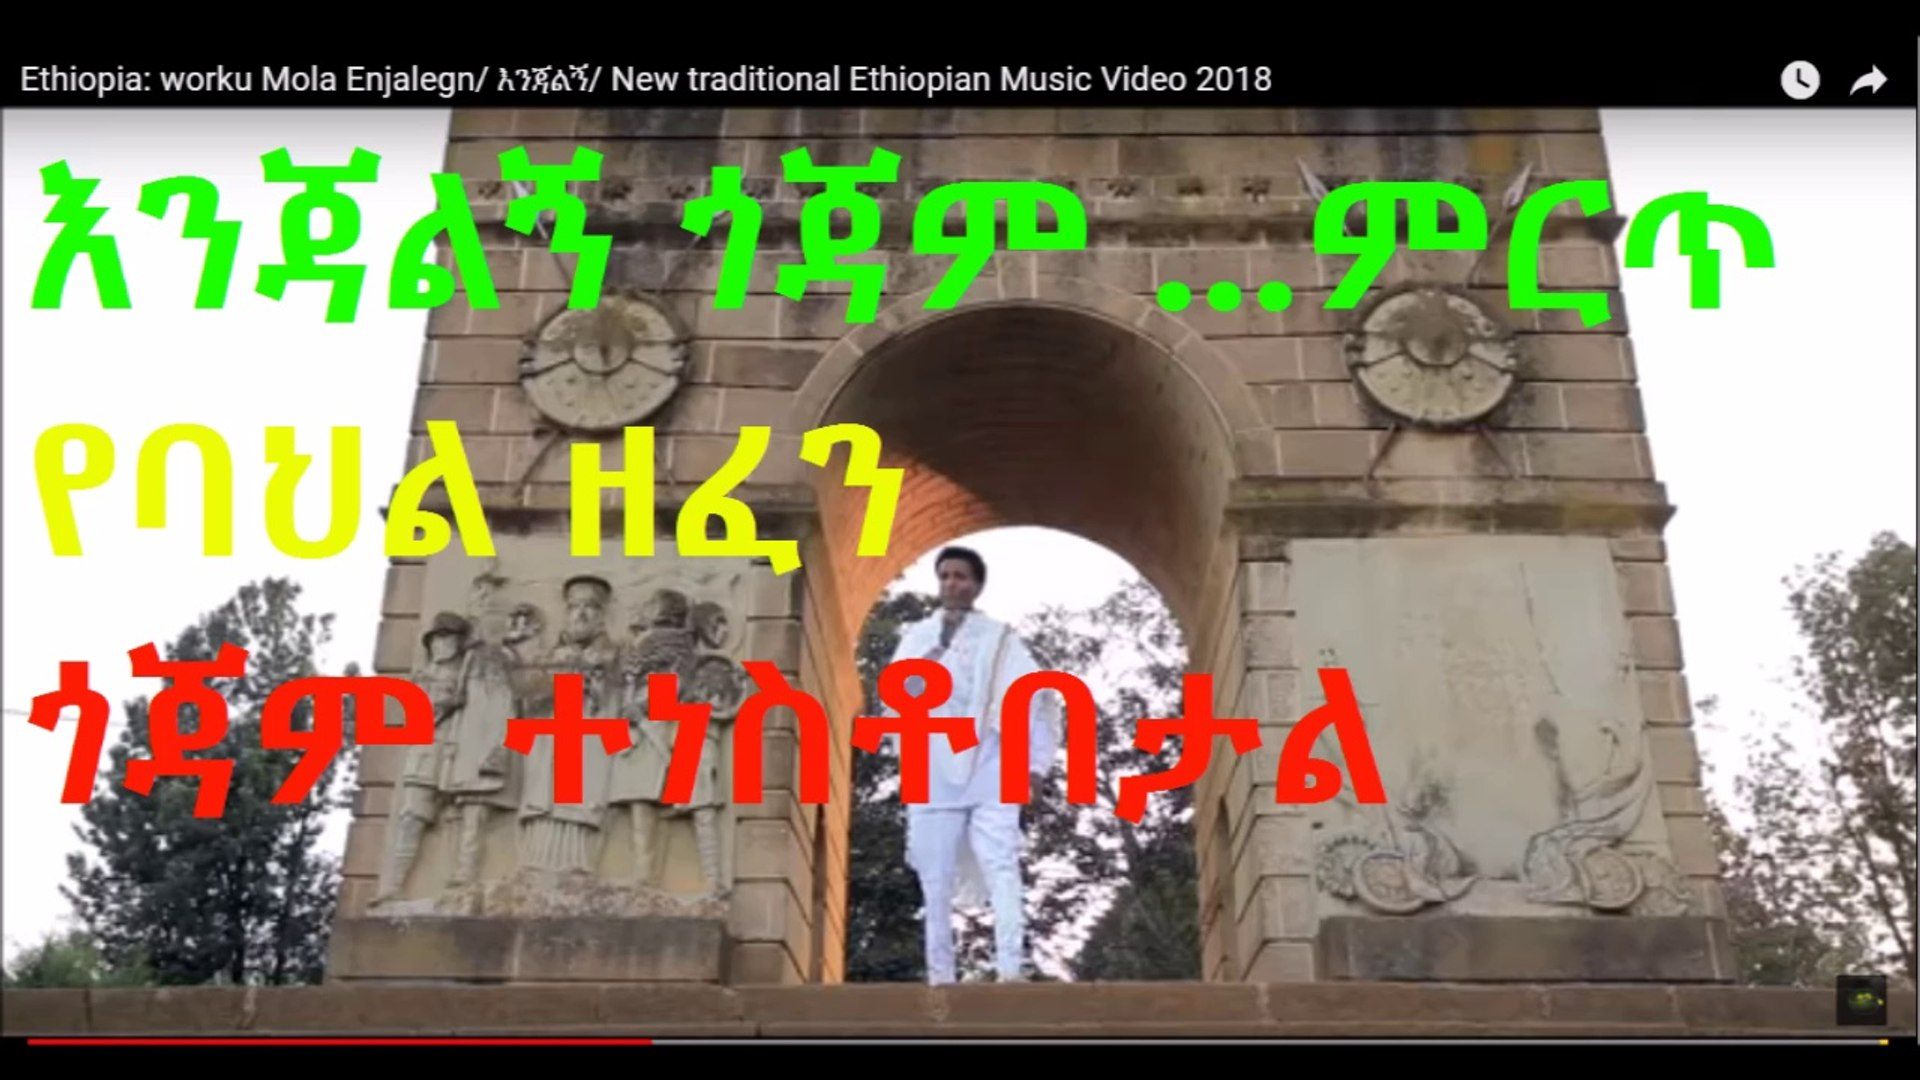 worku Mola Enjalegn እንጃልኝ New traditional Ethiopian Music Video 2018